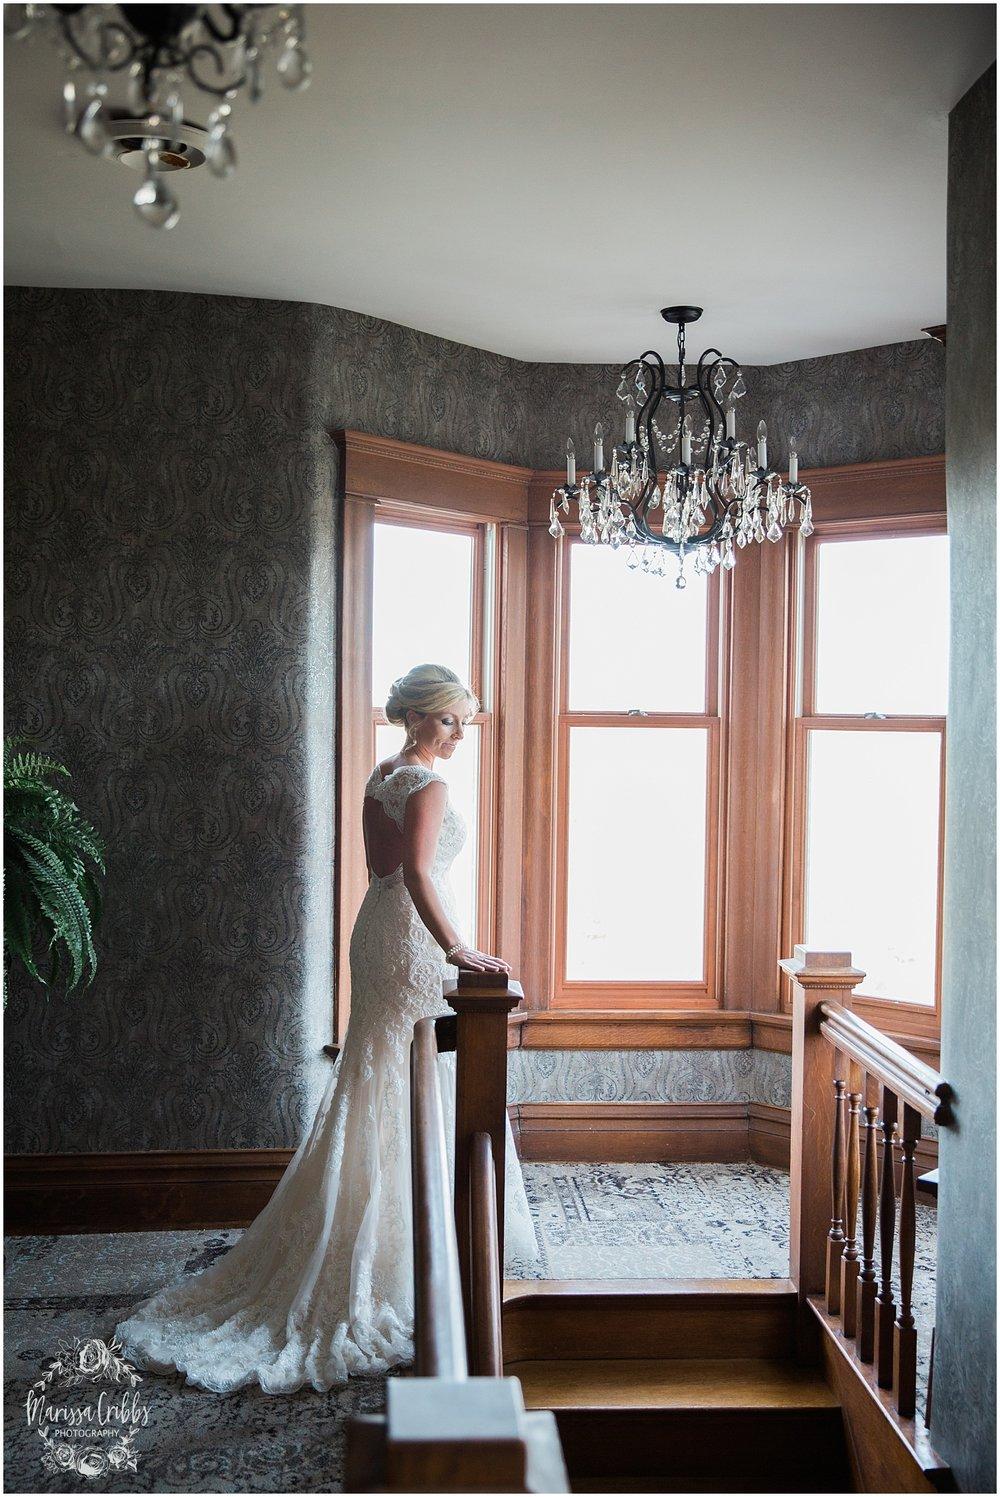 Alex & Amie | Eighteen Ninety Event Space | Marissa Cribbs Photography | Kansas City Perfect Wedding Guide_1262.jpg